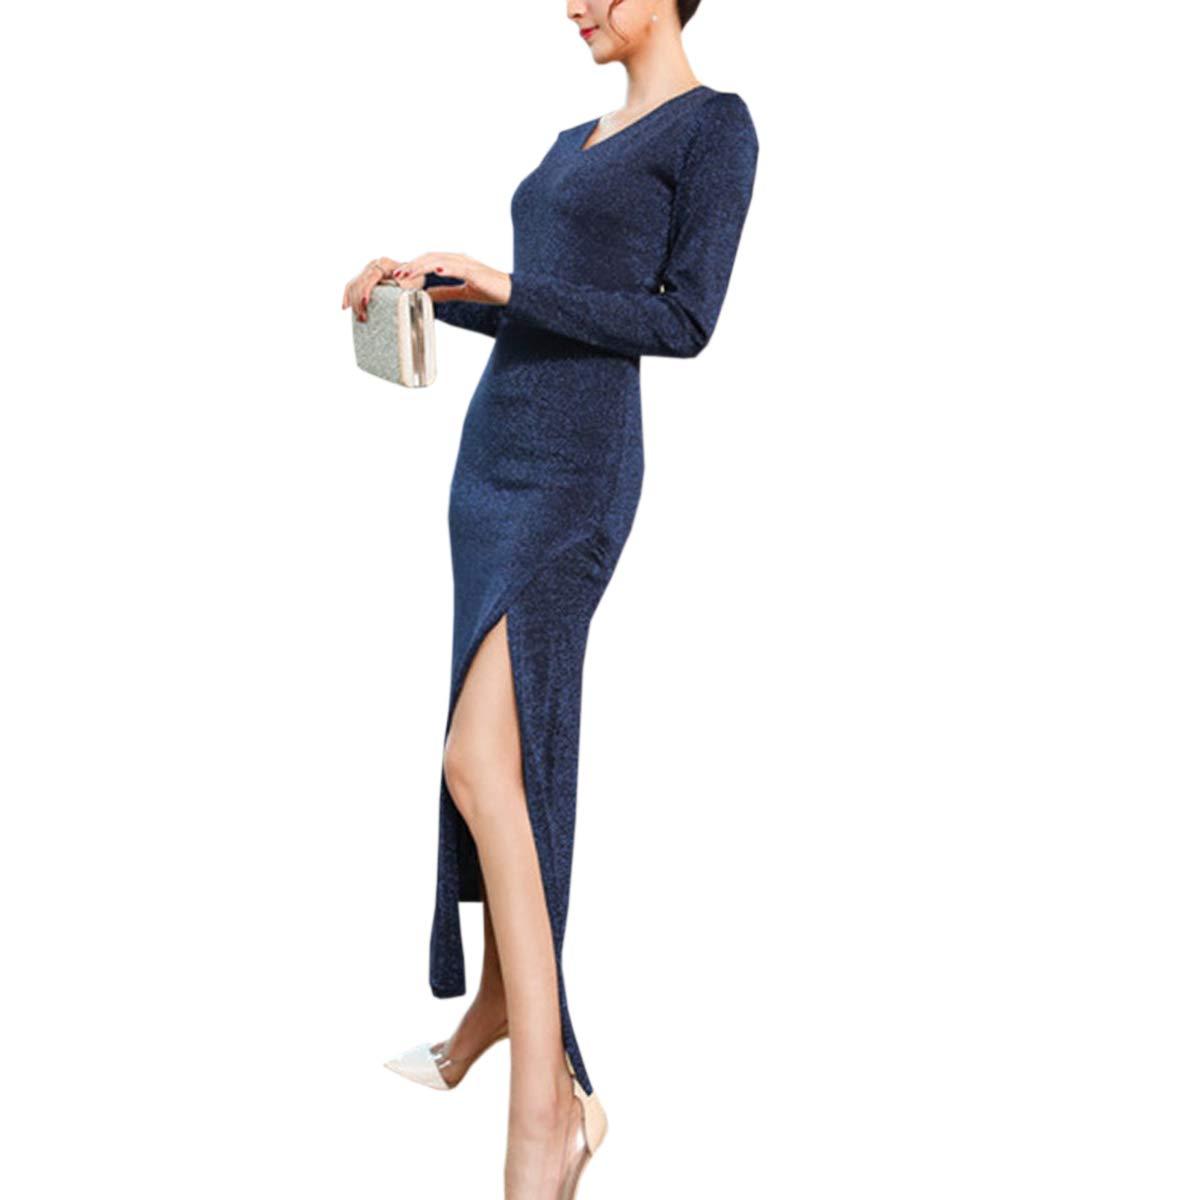 bluee CNBJMAZA V Neck Solid Knitwear Split Bodycon Floor Length Long Sleeve Women's Party Dress